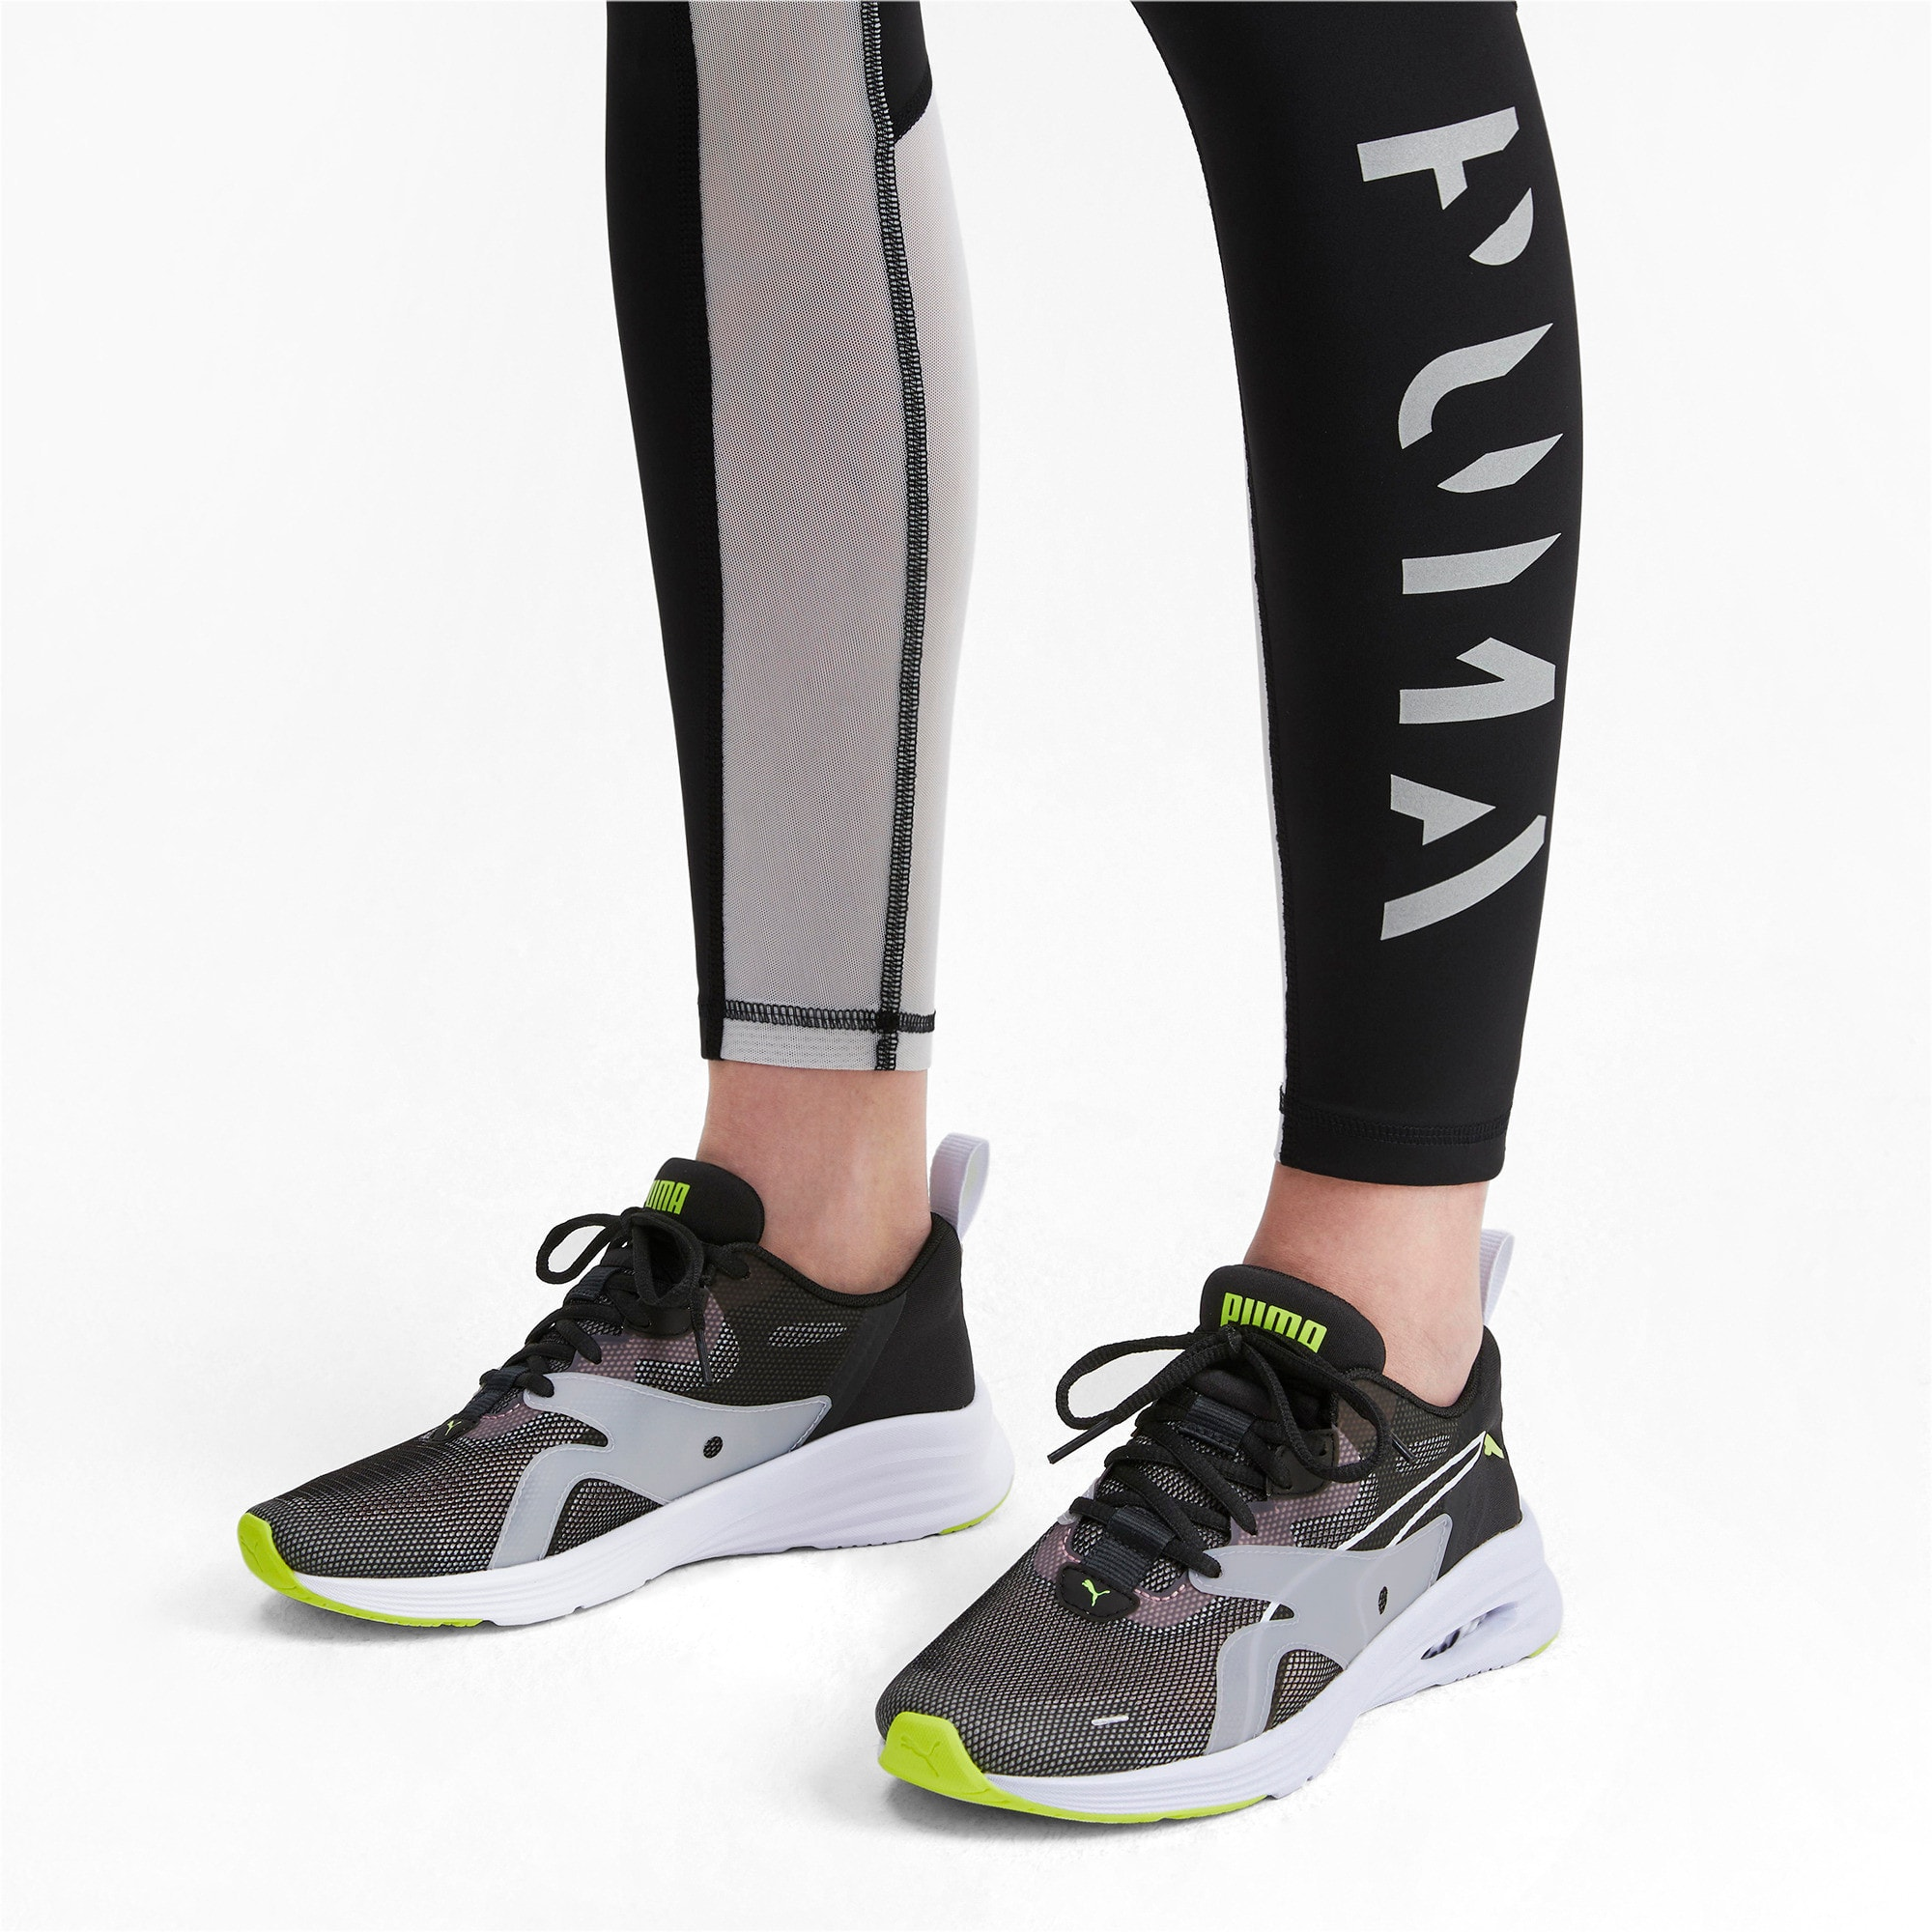 Thumbnail 3 of HYBRID Fuego Shift Women's Running Shoes, Puma Black-Bridal Rose, medium-IND